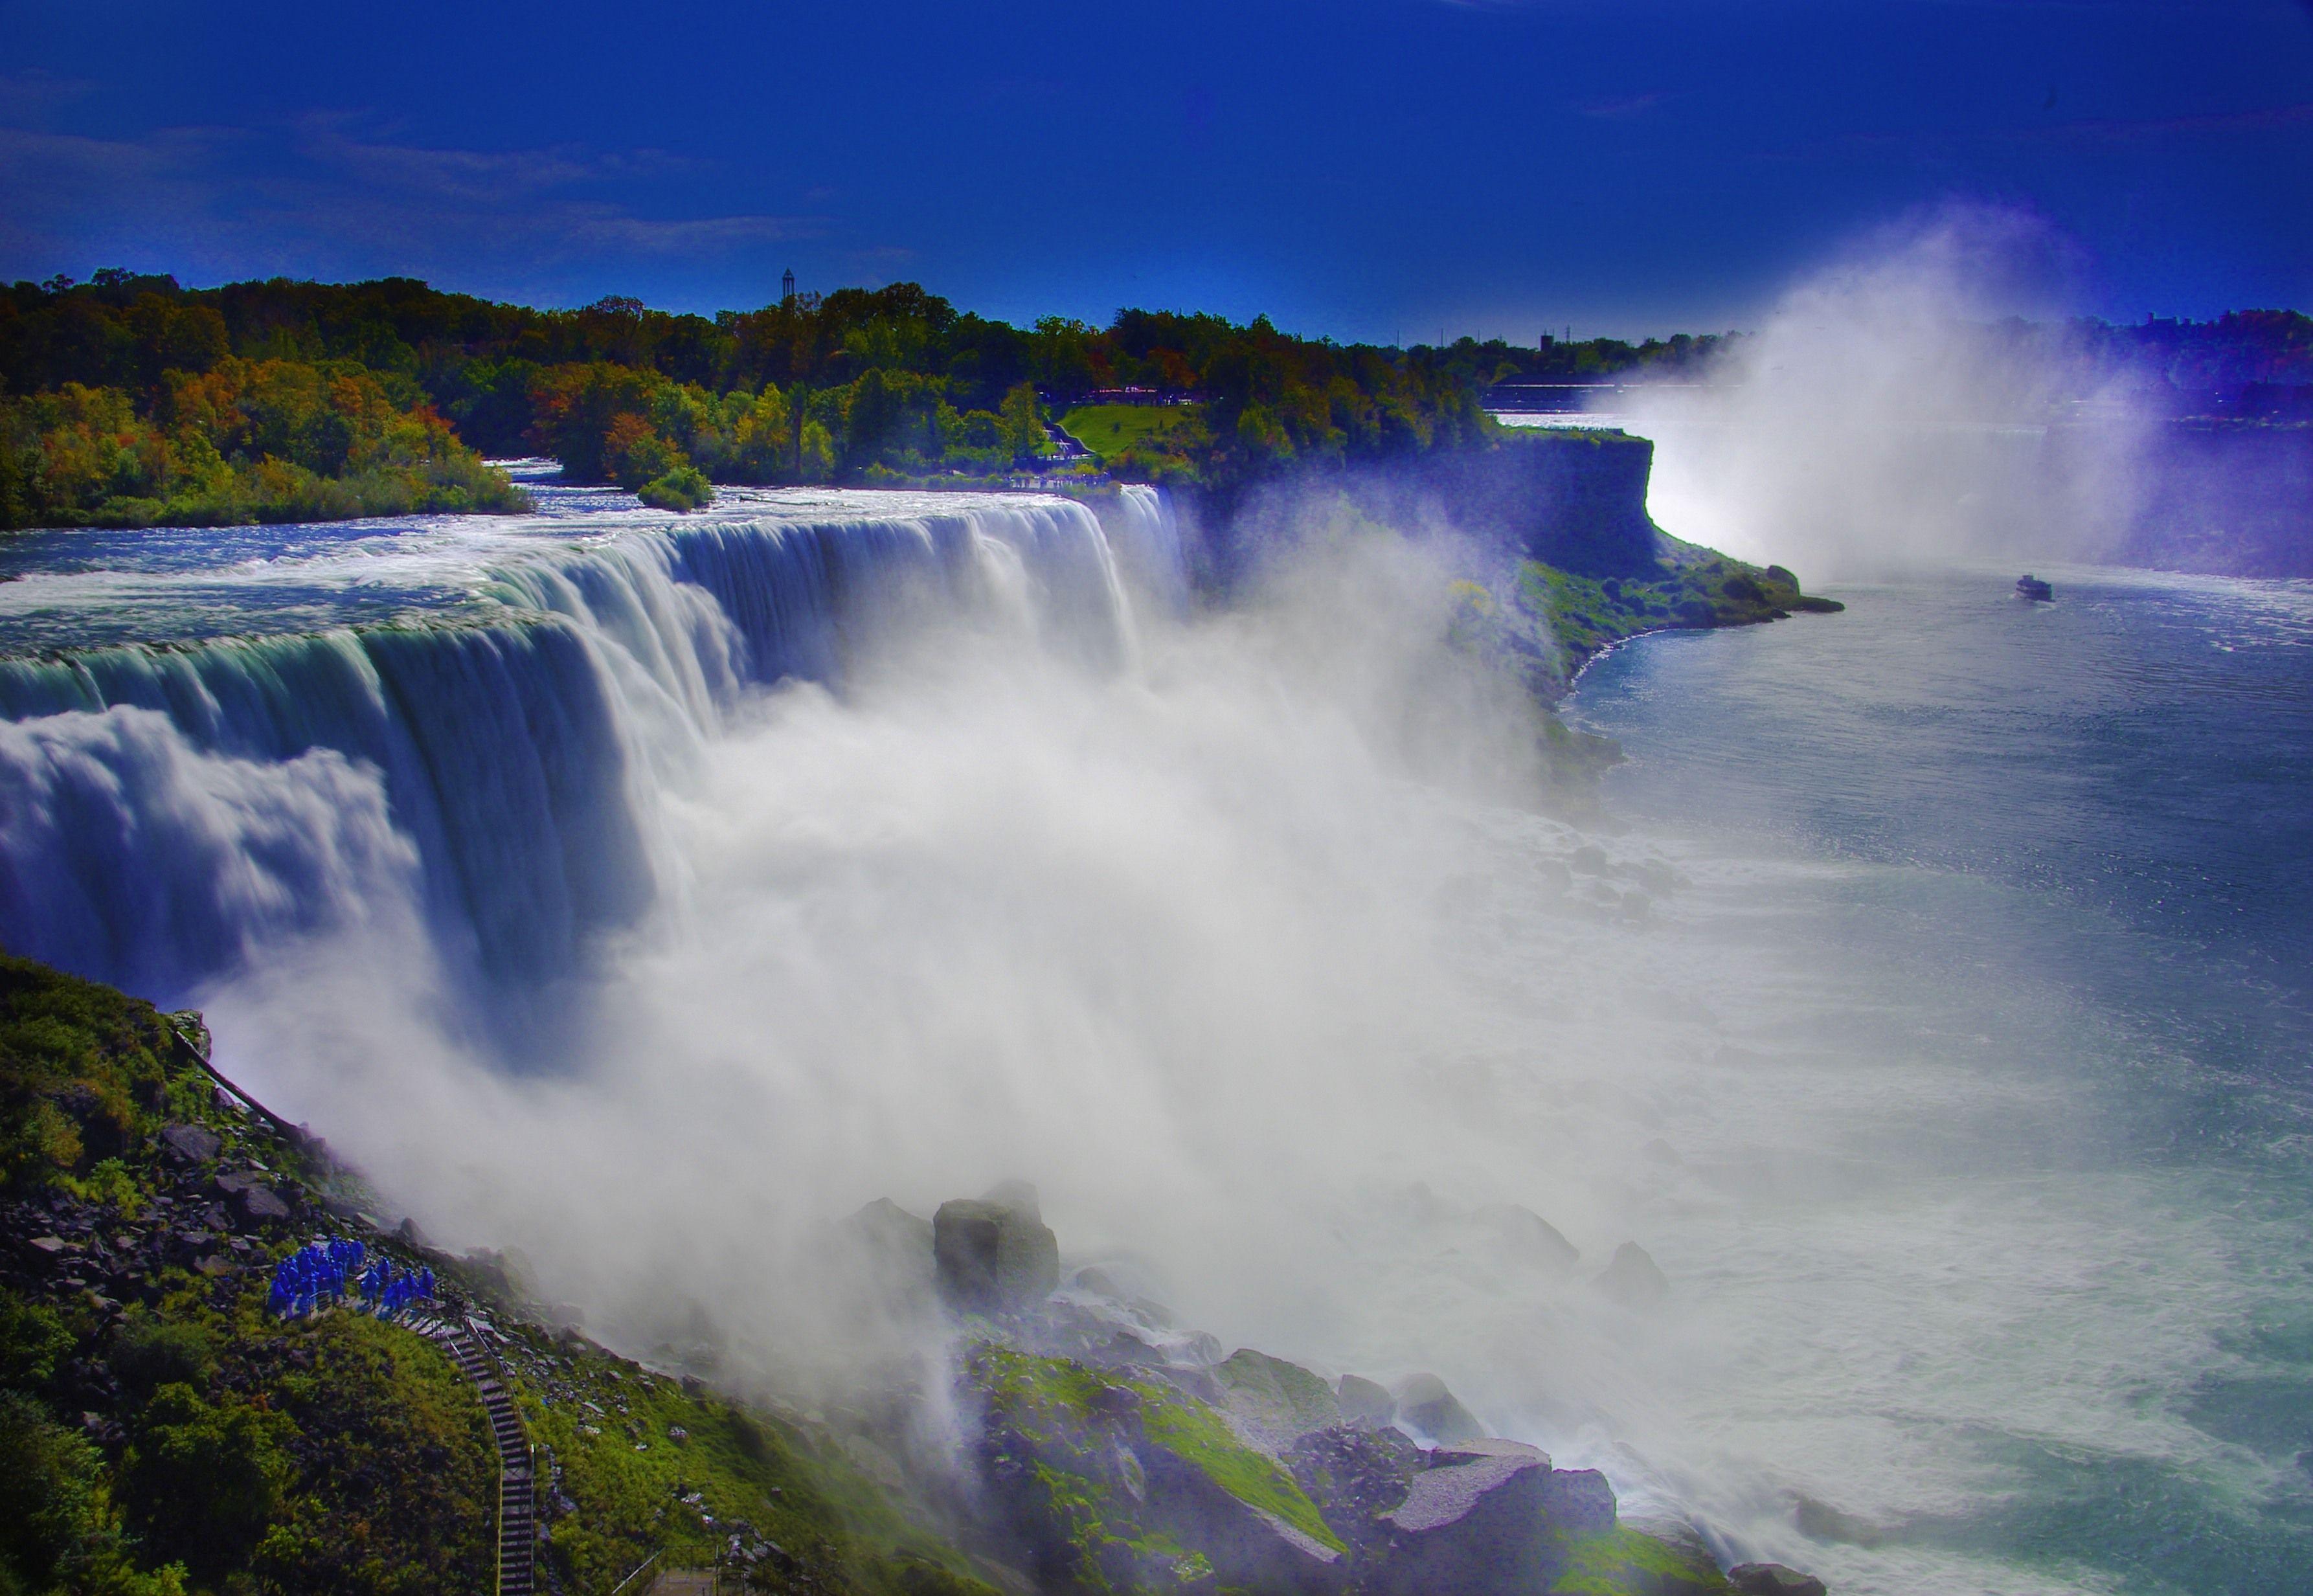 niagra falls | Niagara falls - Pentax User Photo Gallery